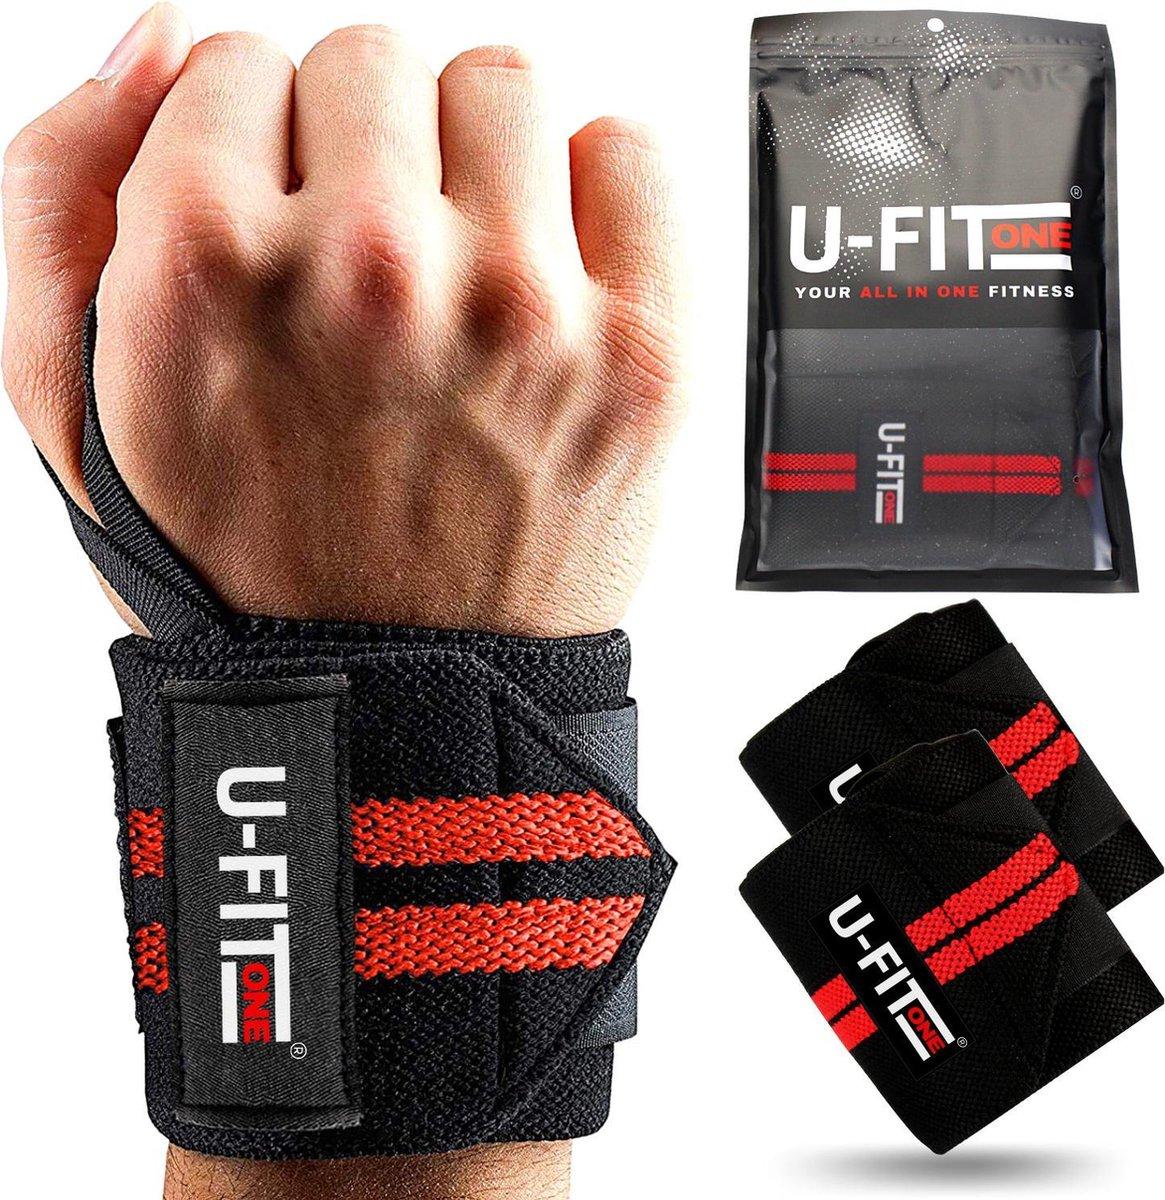 U Fit One  2 Stuks Wrist wraps - krachttraining - Polsbrace - Pols wraps - Polssteun - Polsbandage -